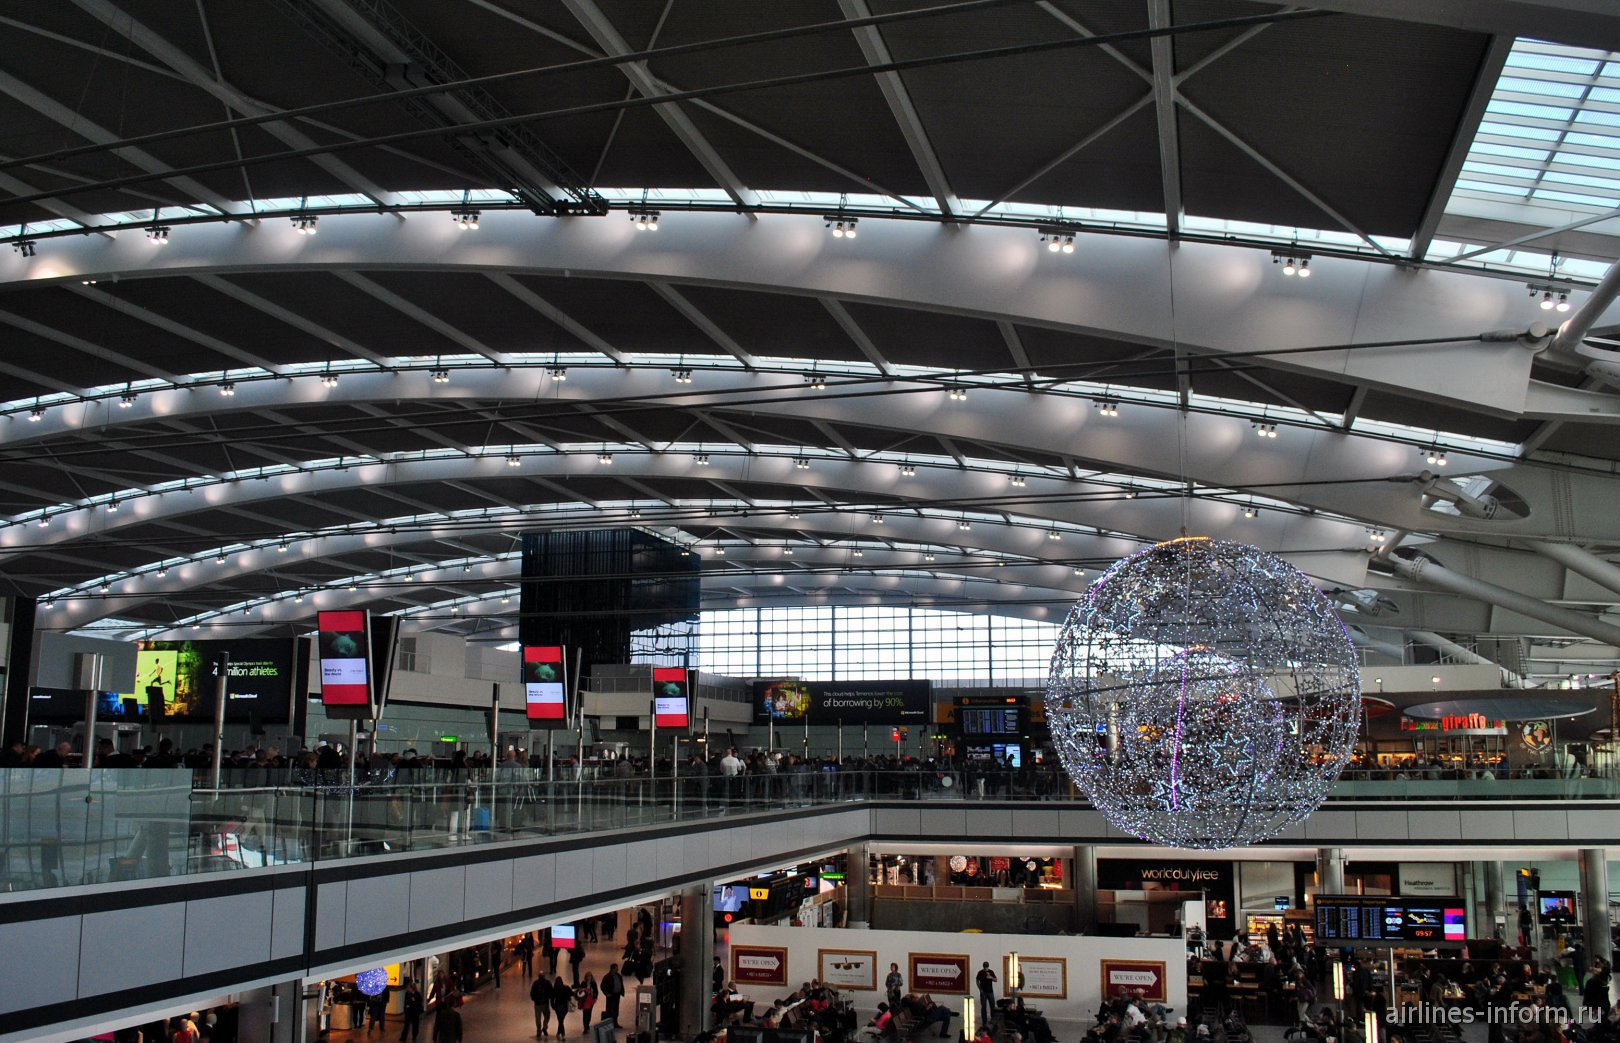 Верхний ярус терминала Т5А аэропорта Лондон Хитроу